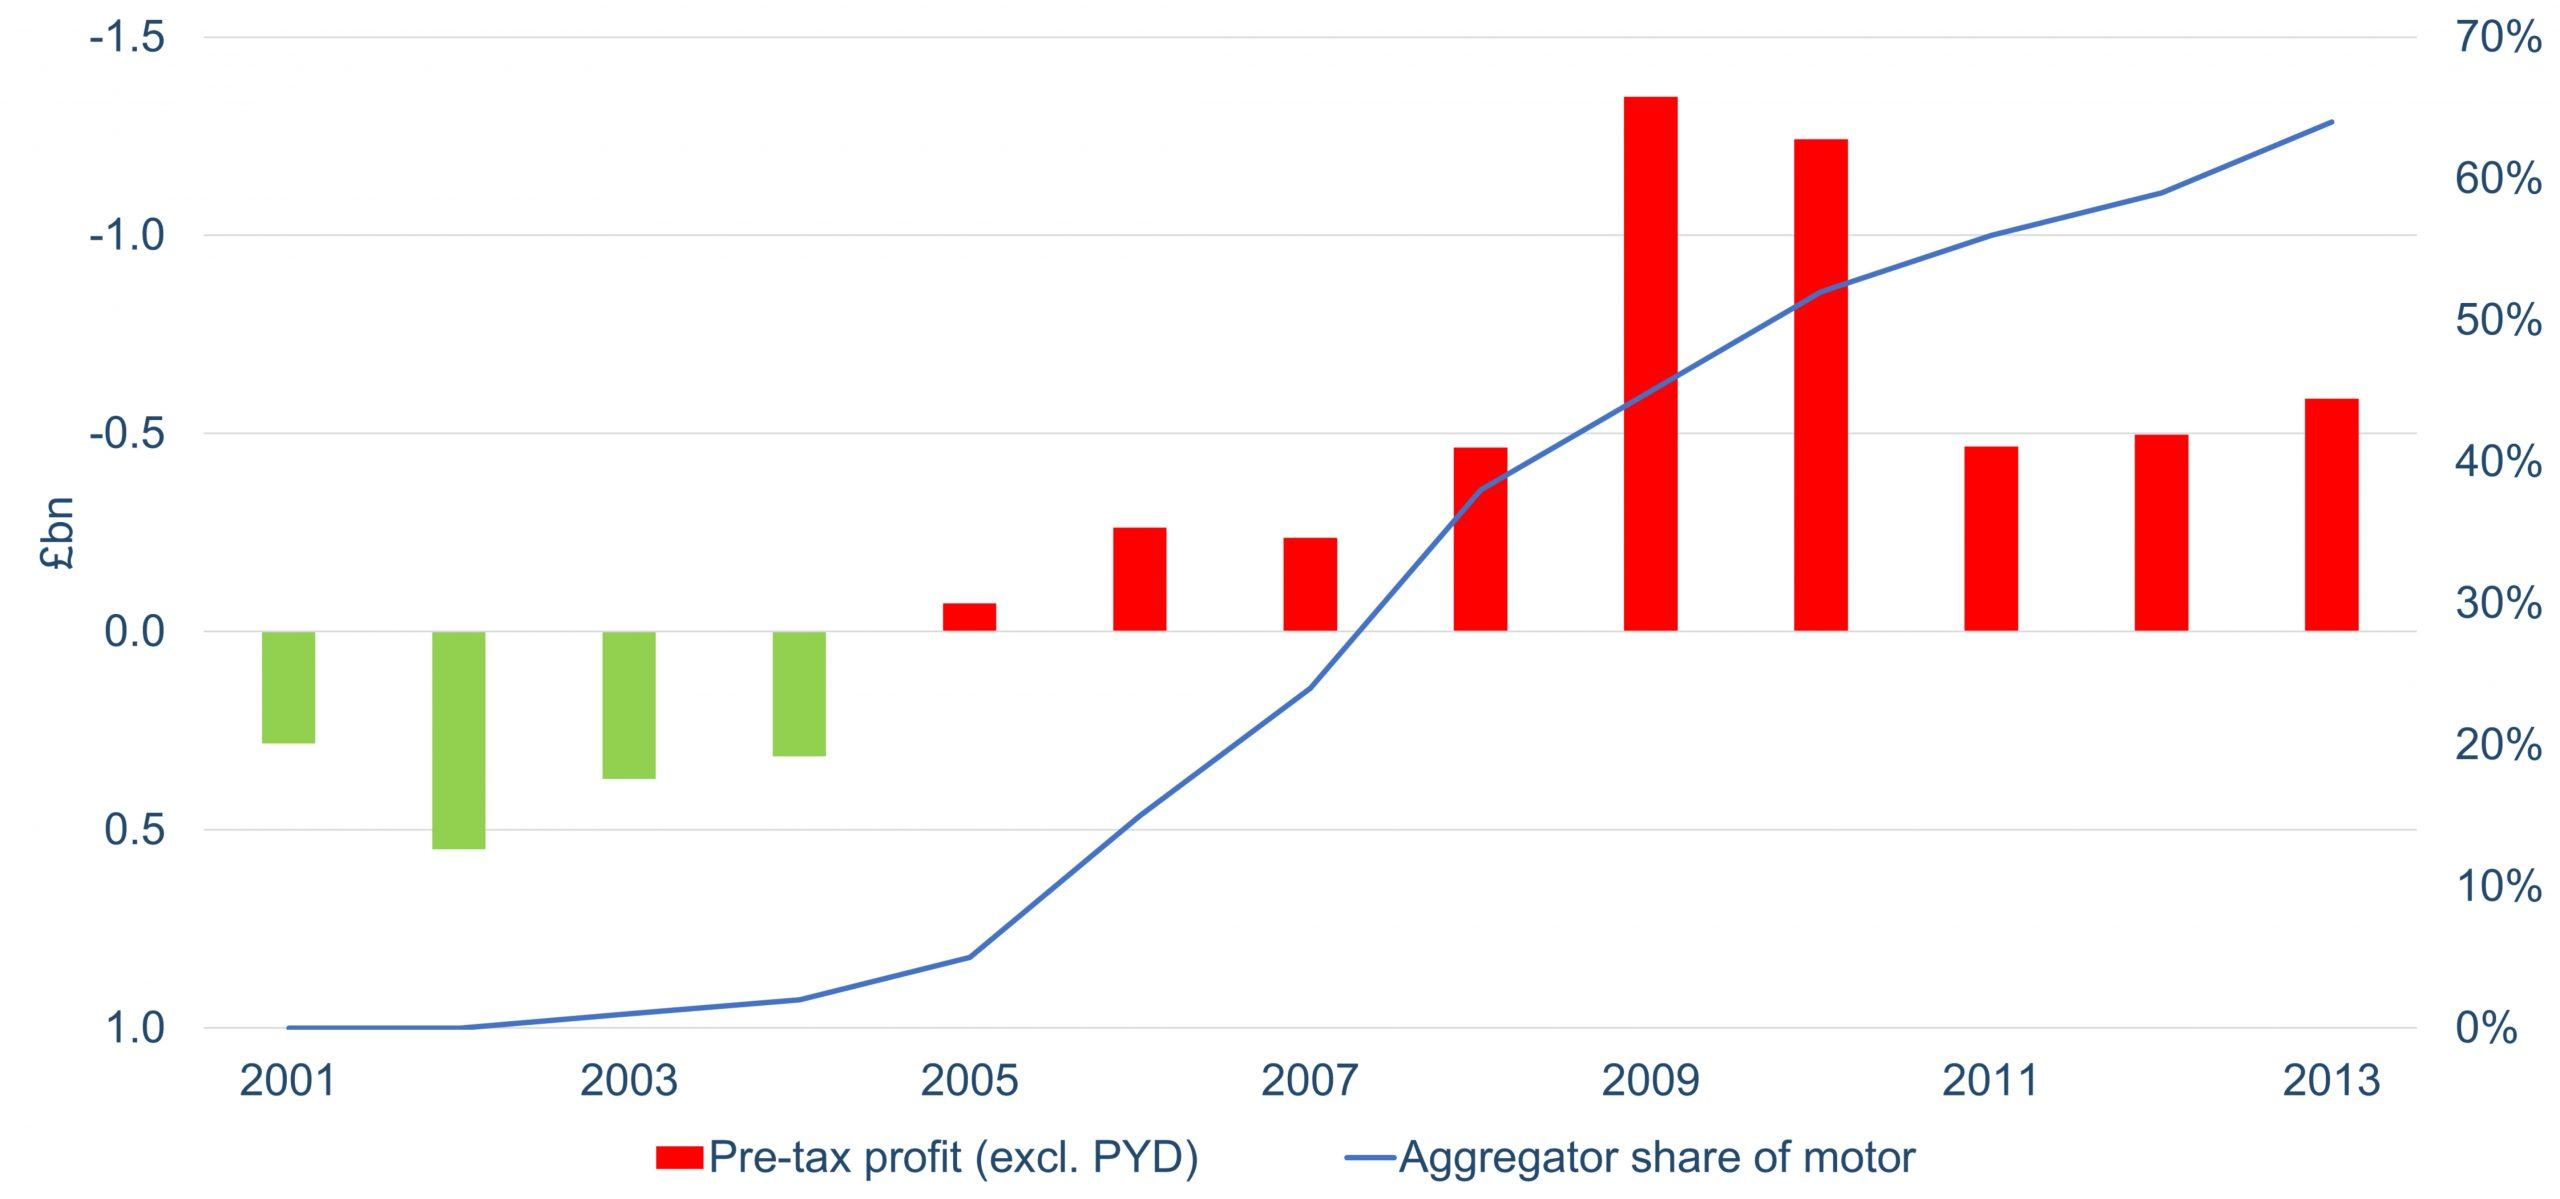 Figure 1 - Impact of price comparison website growth on UK market profitability